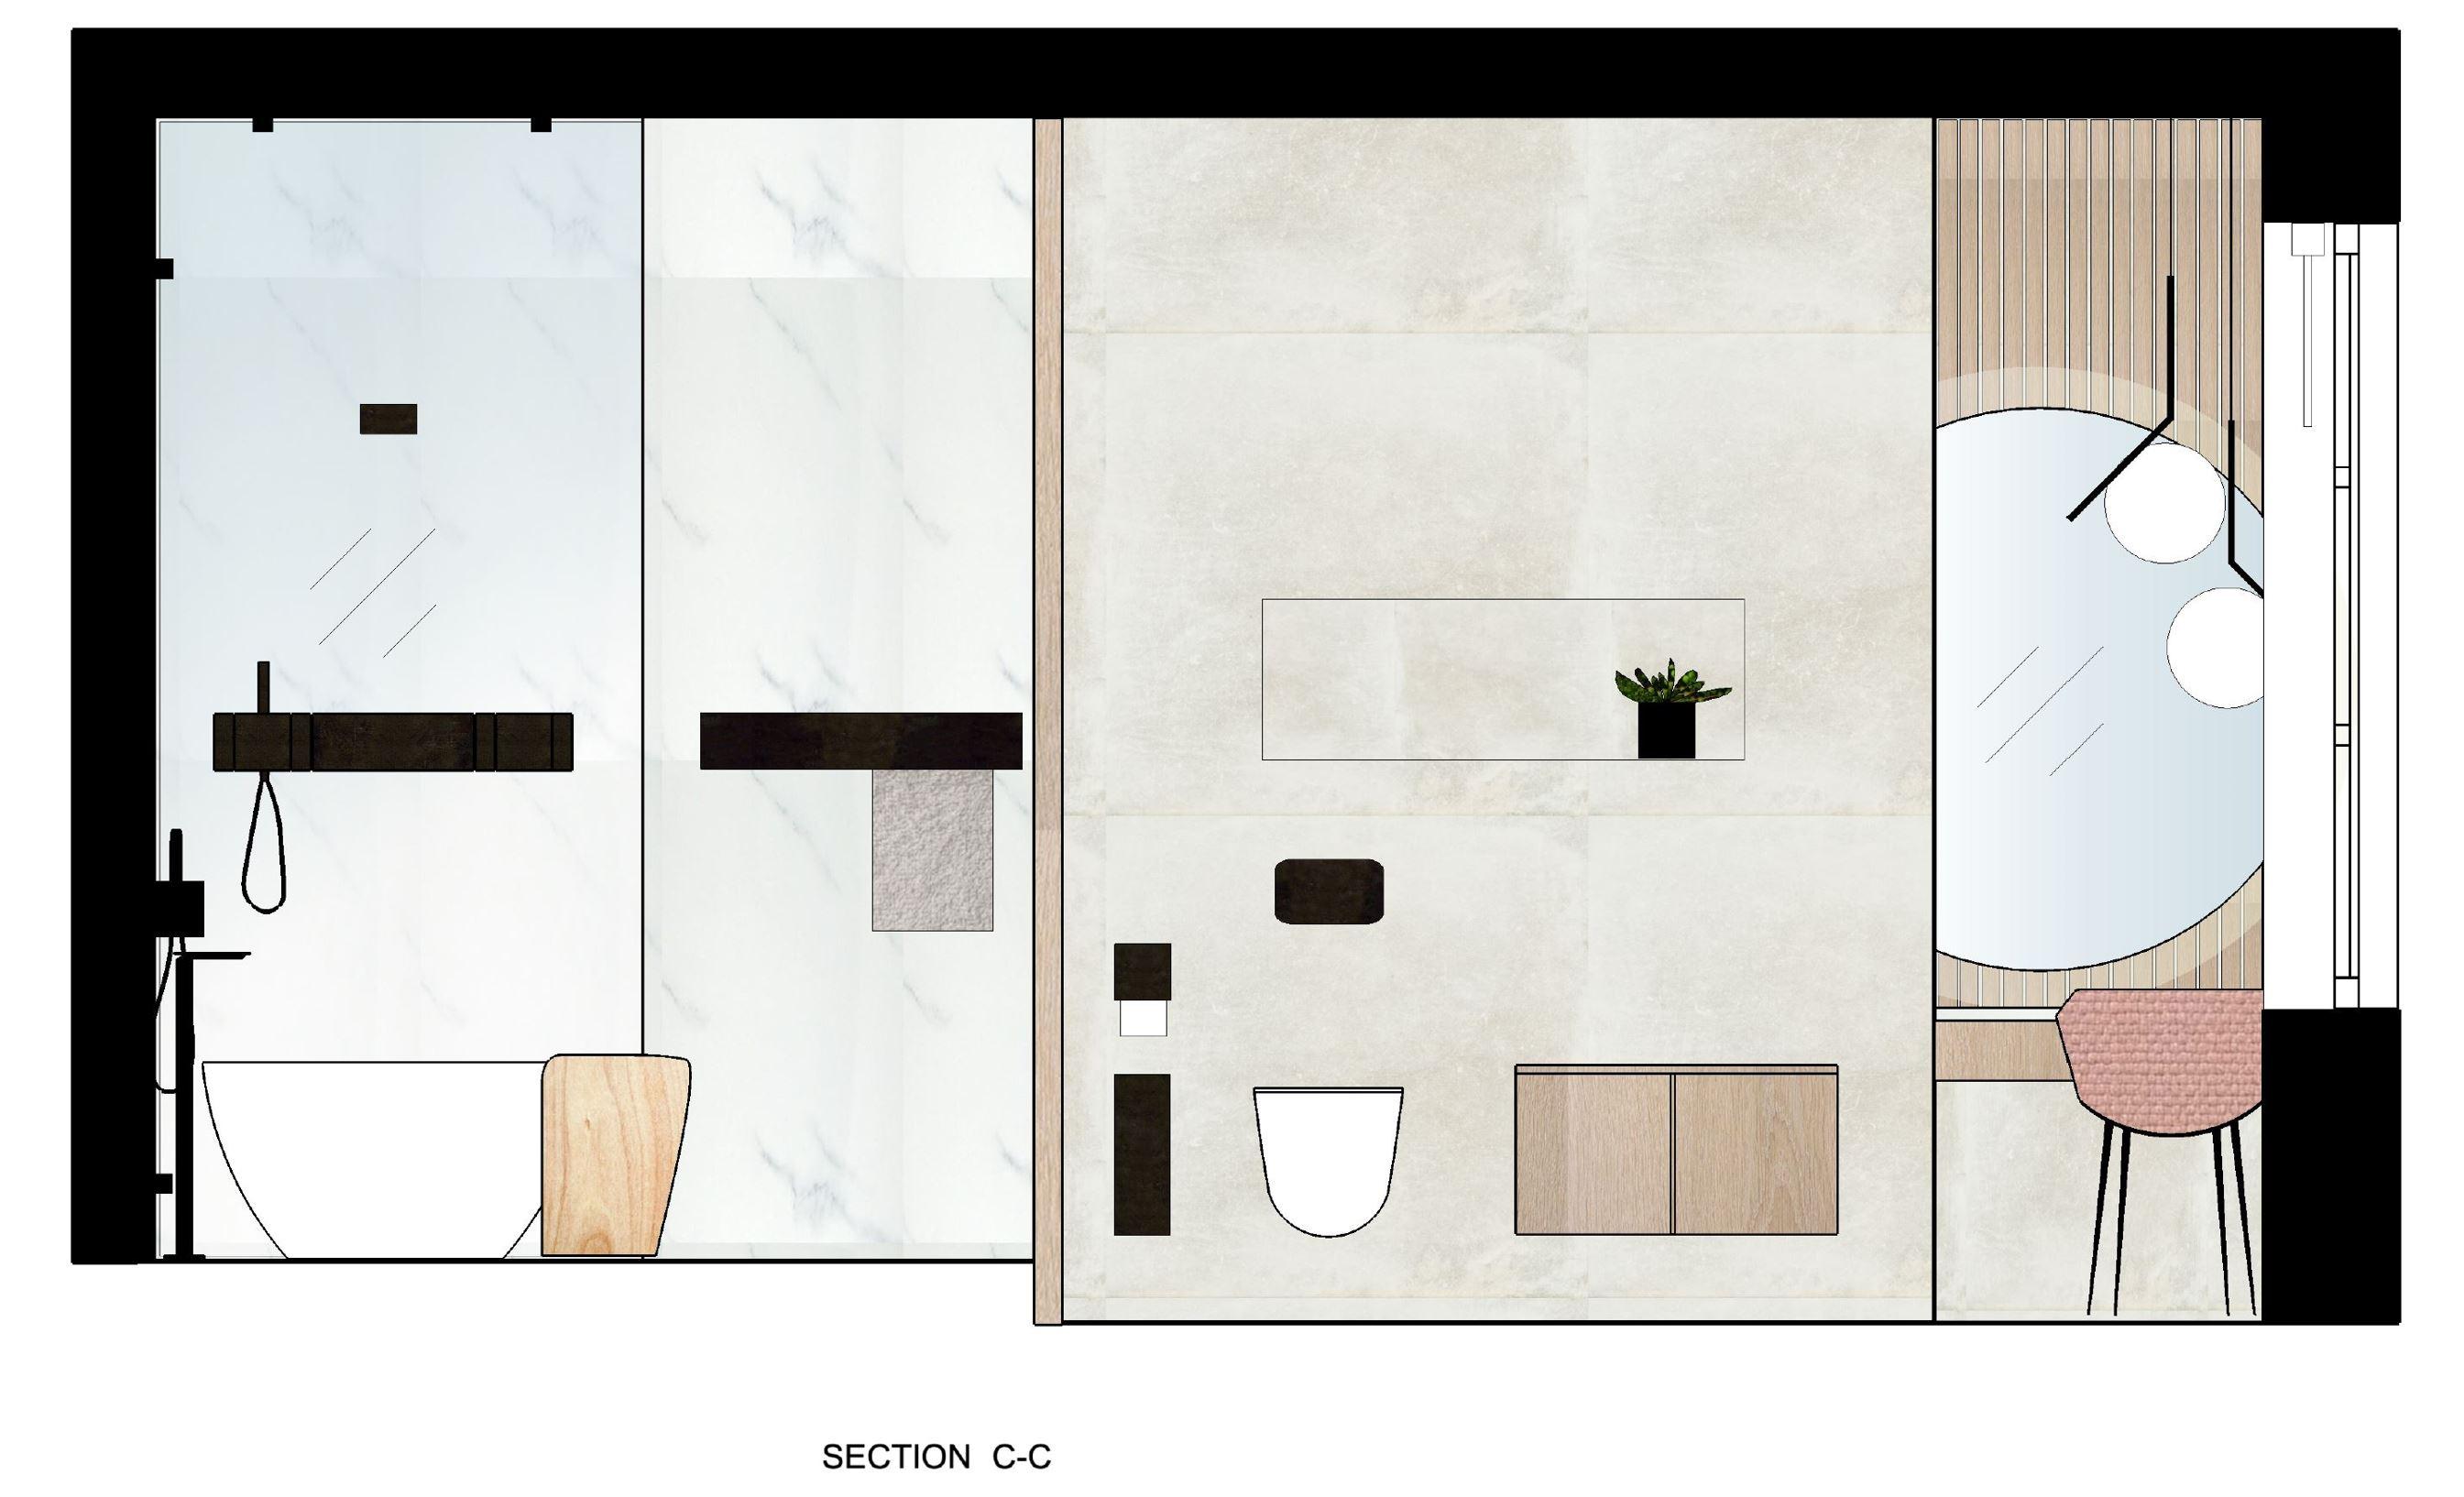 Triinu Oll's floorplan designs for a bathroom space